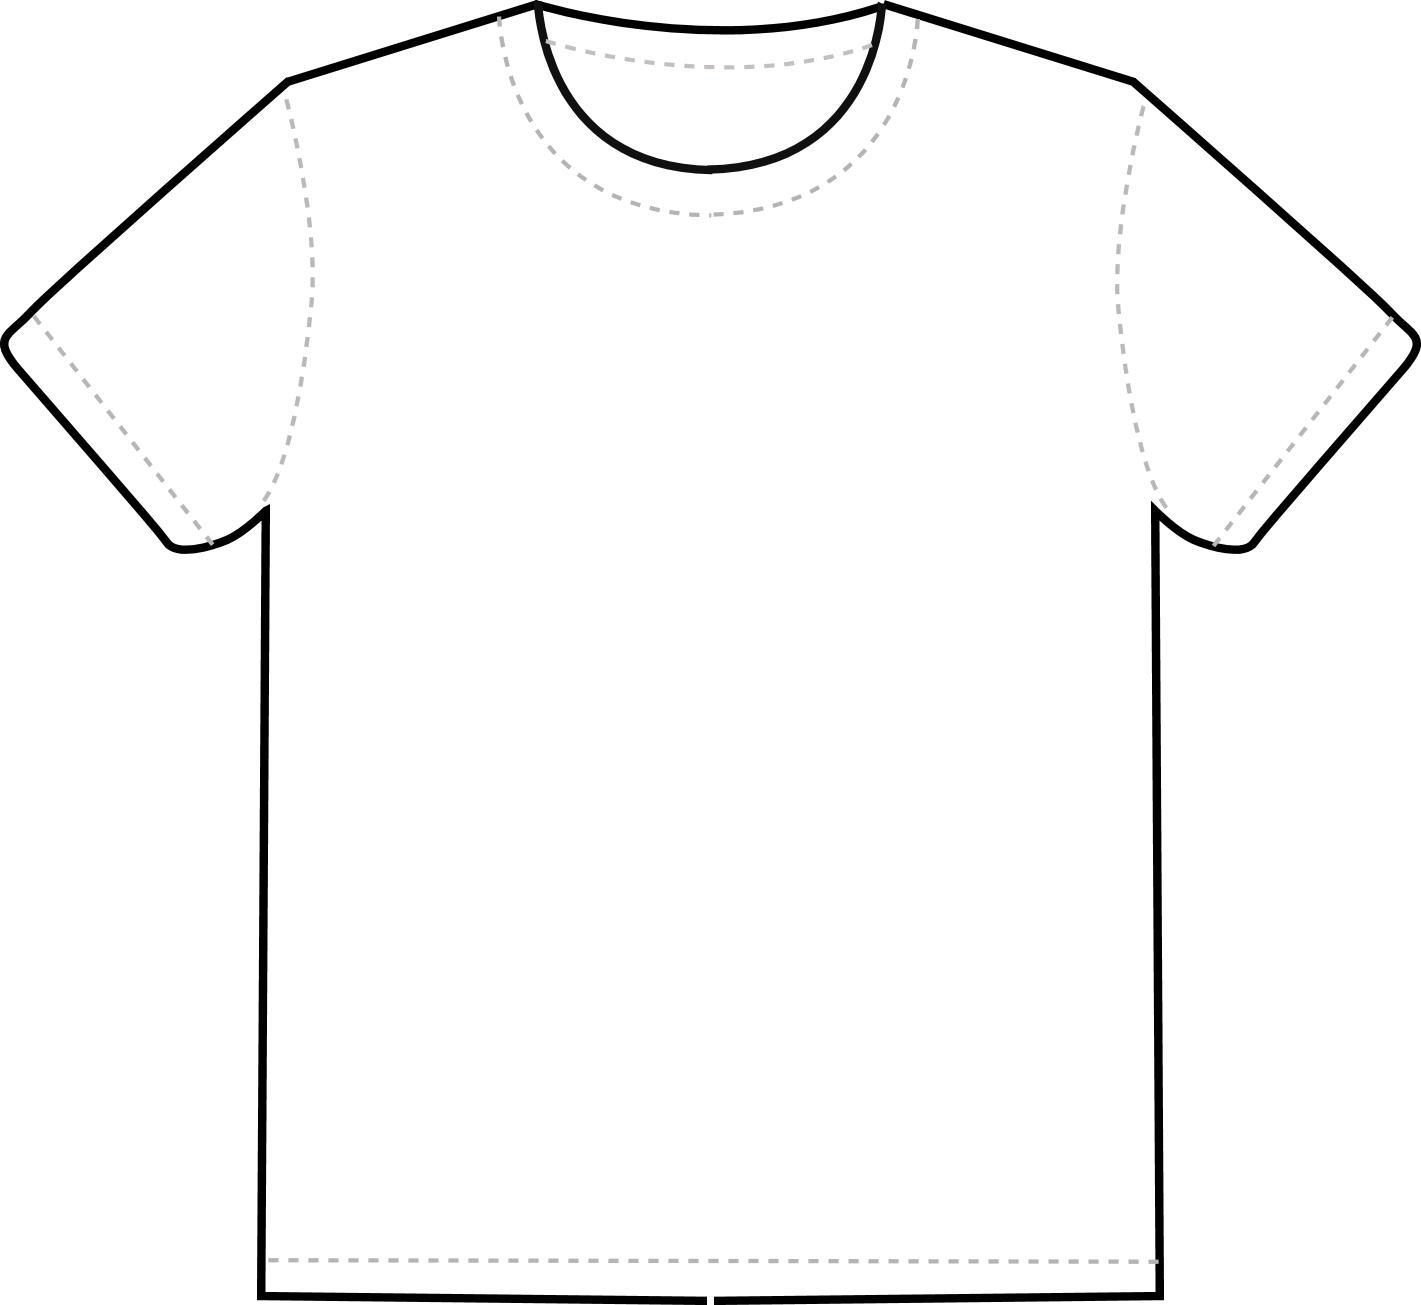 Trends For Blank T Shirt .-Trends For Blank T Shirt .-18